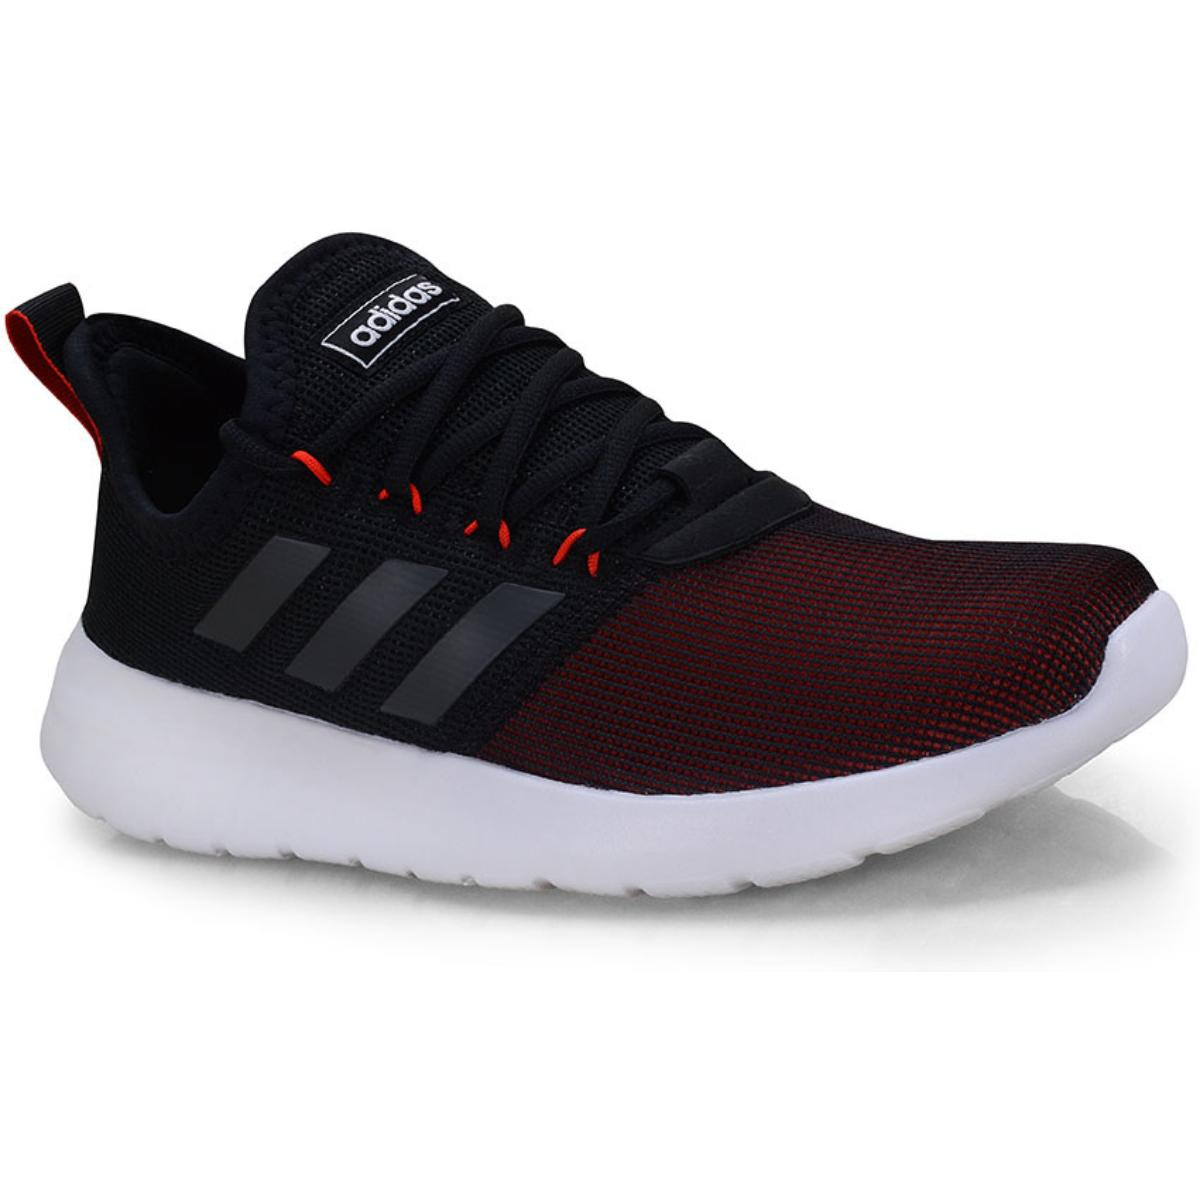 Tênis Masculino Adidas Ee8266 Lite Racer Rbn m Preto/vermelho/branco